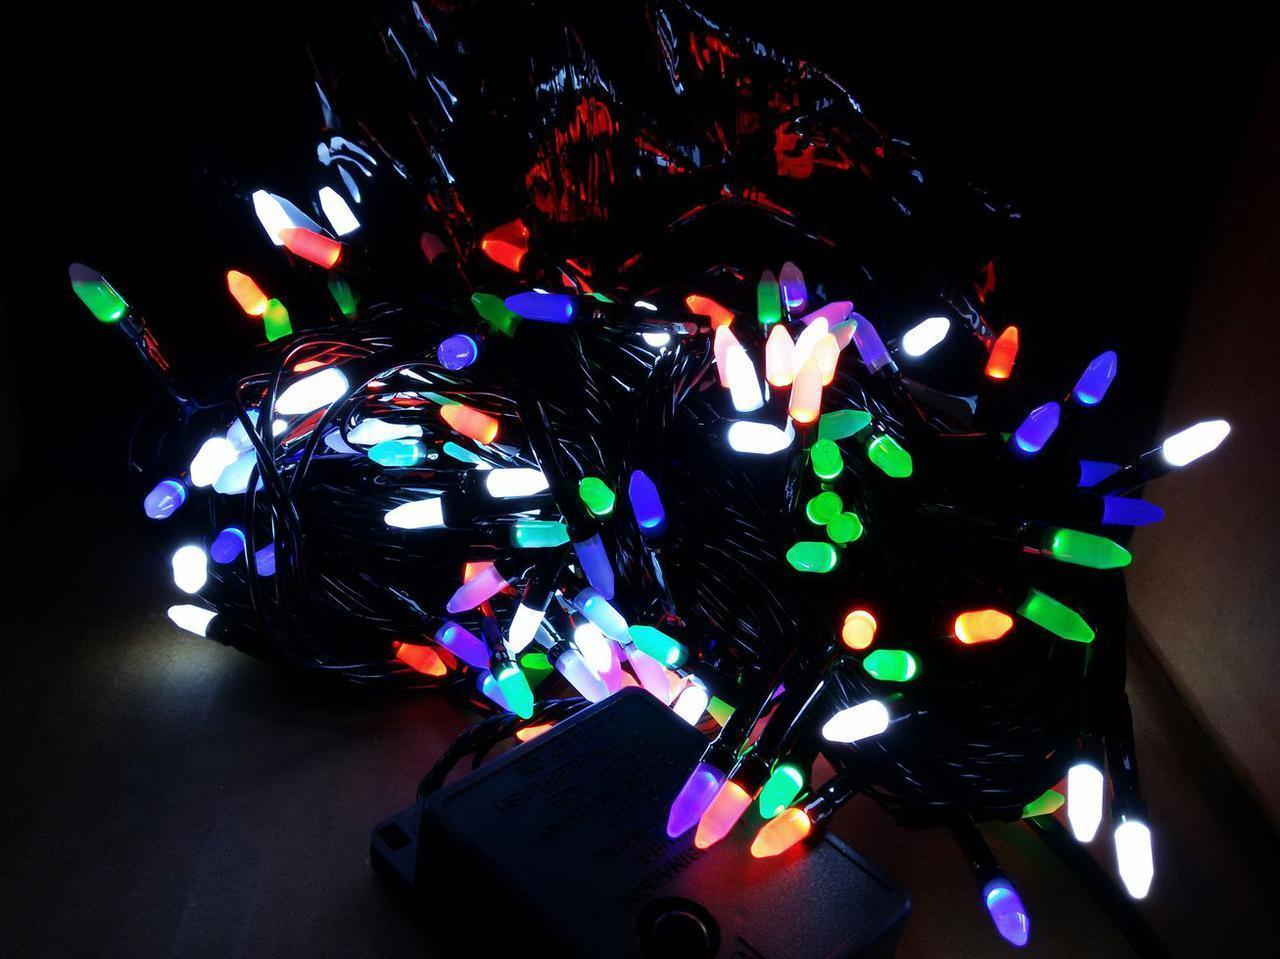 Гирлянда 200 LED ИГОЛКА (РИС) на черном проводе 5mm, разного цвета